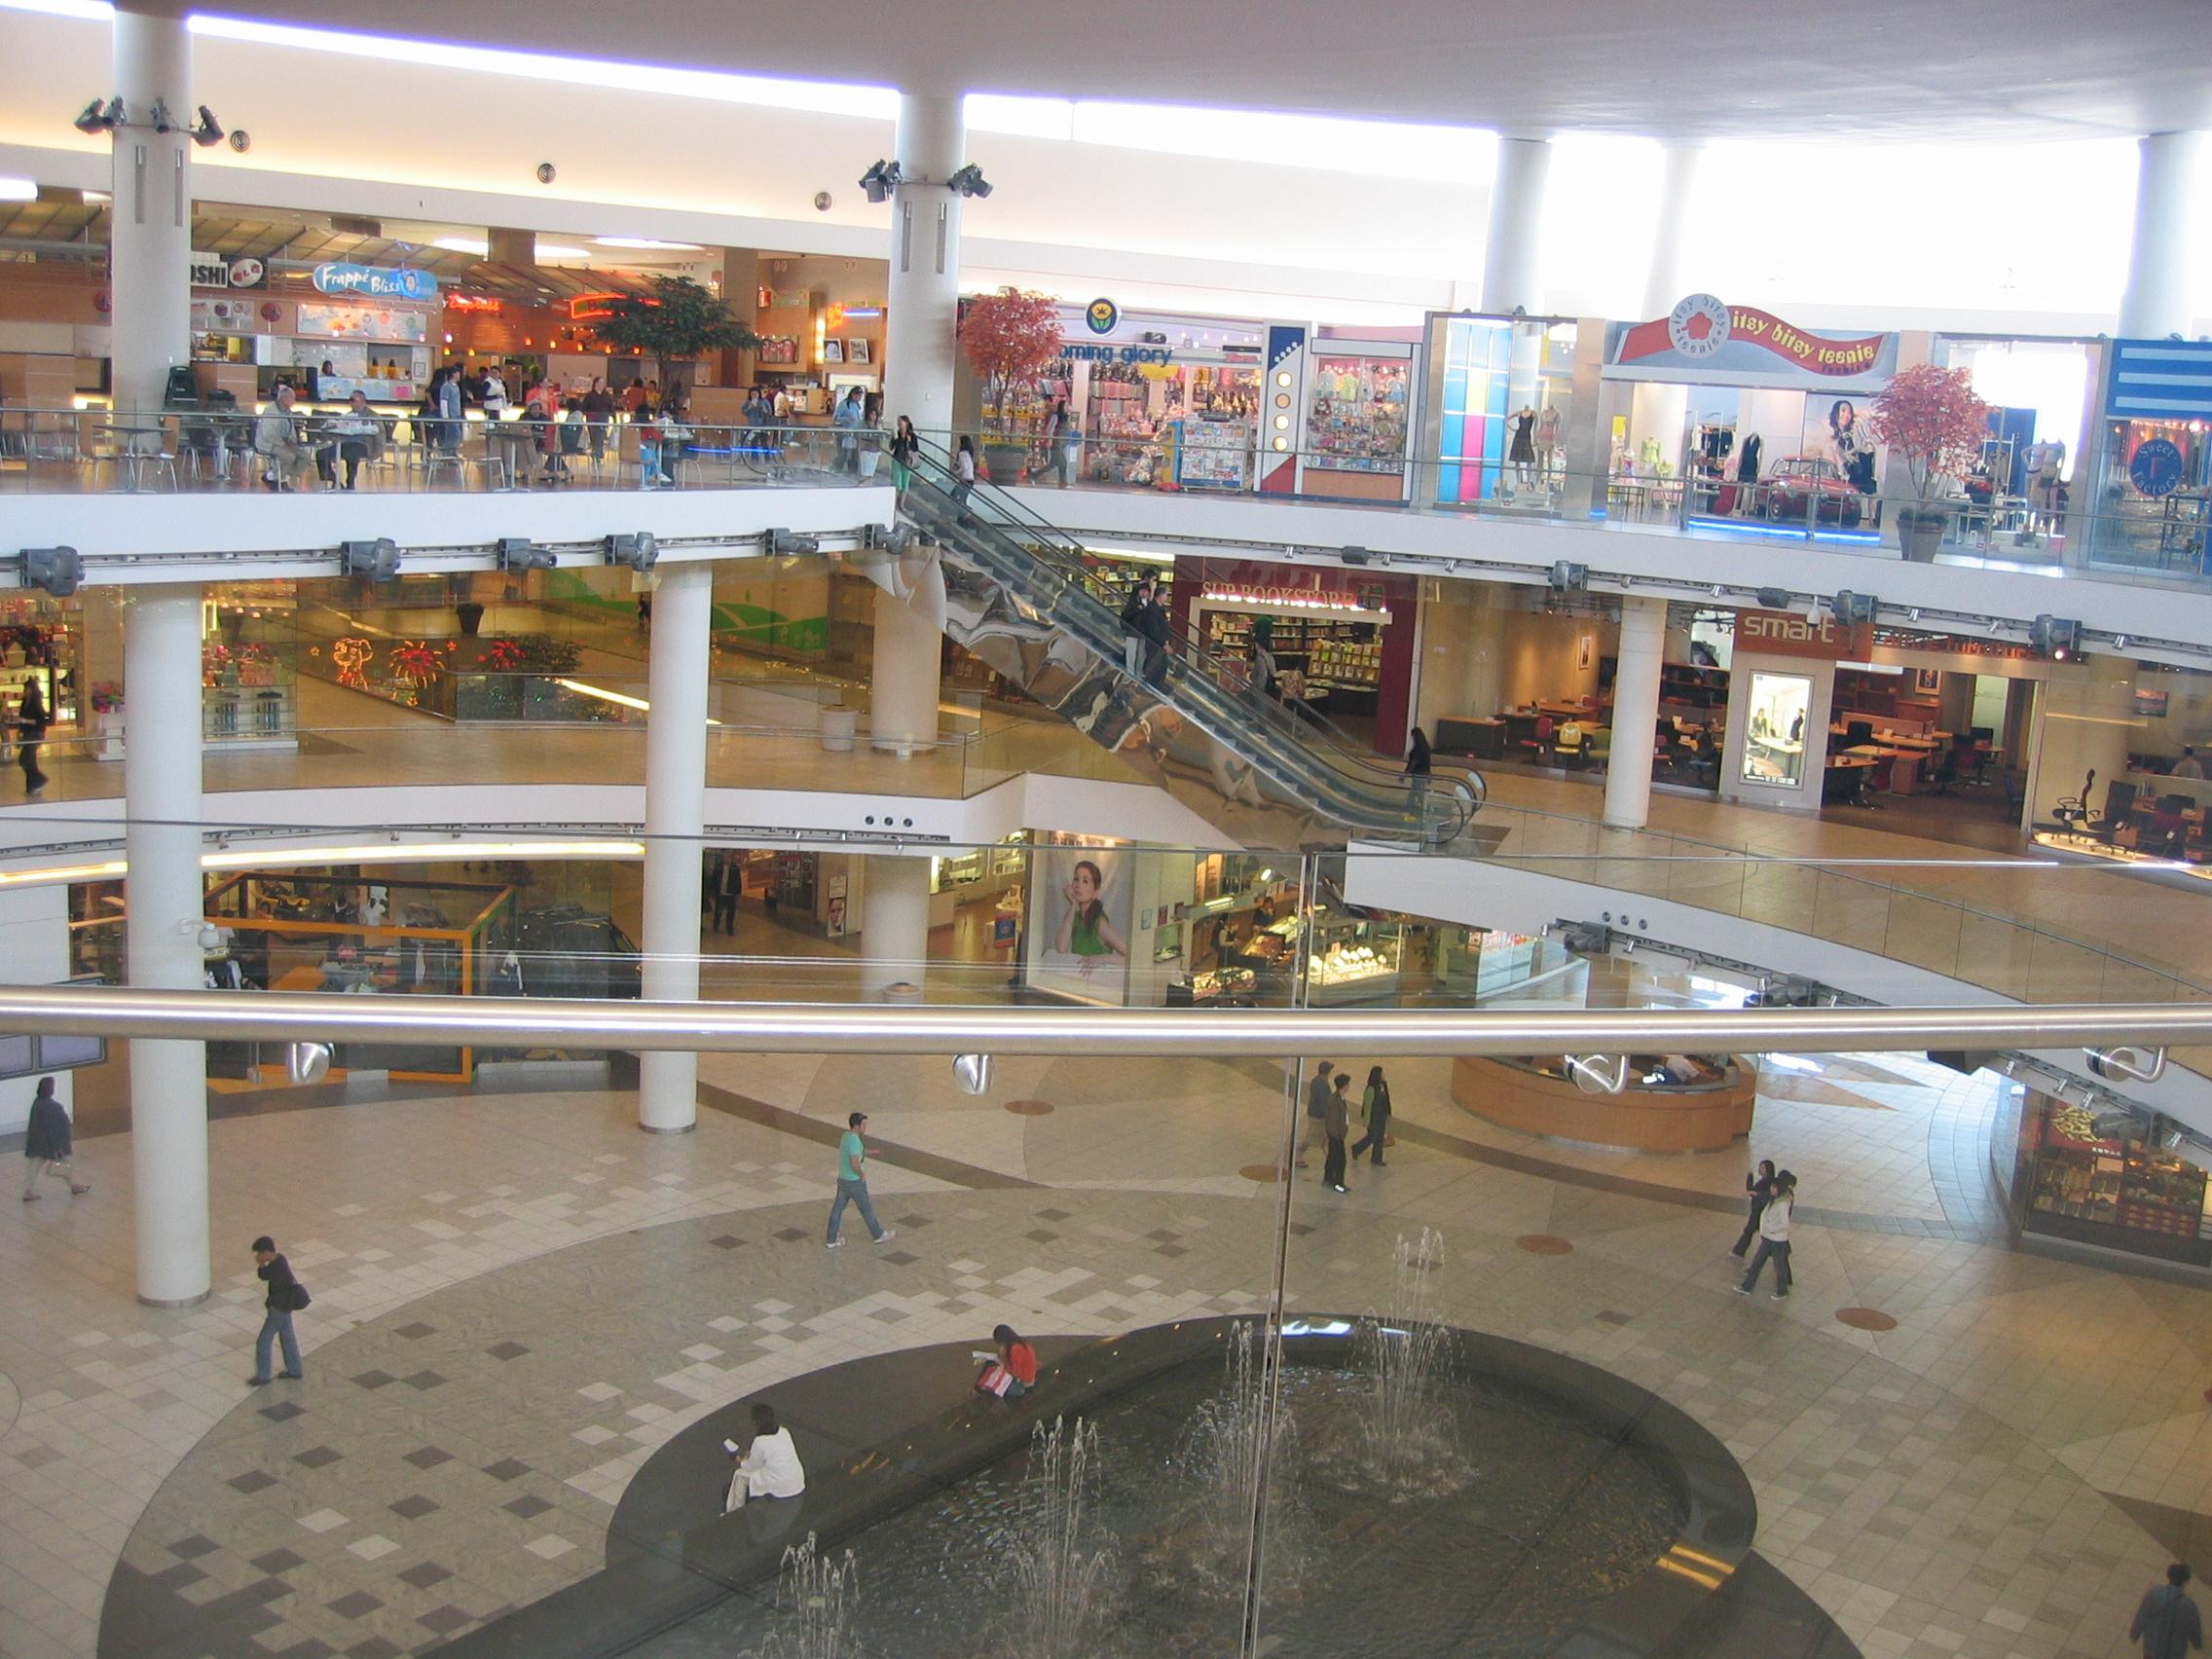 richmond centre mall vancouver swingers jpg 422x640